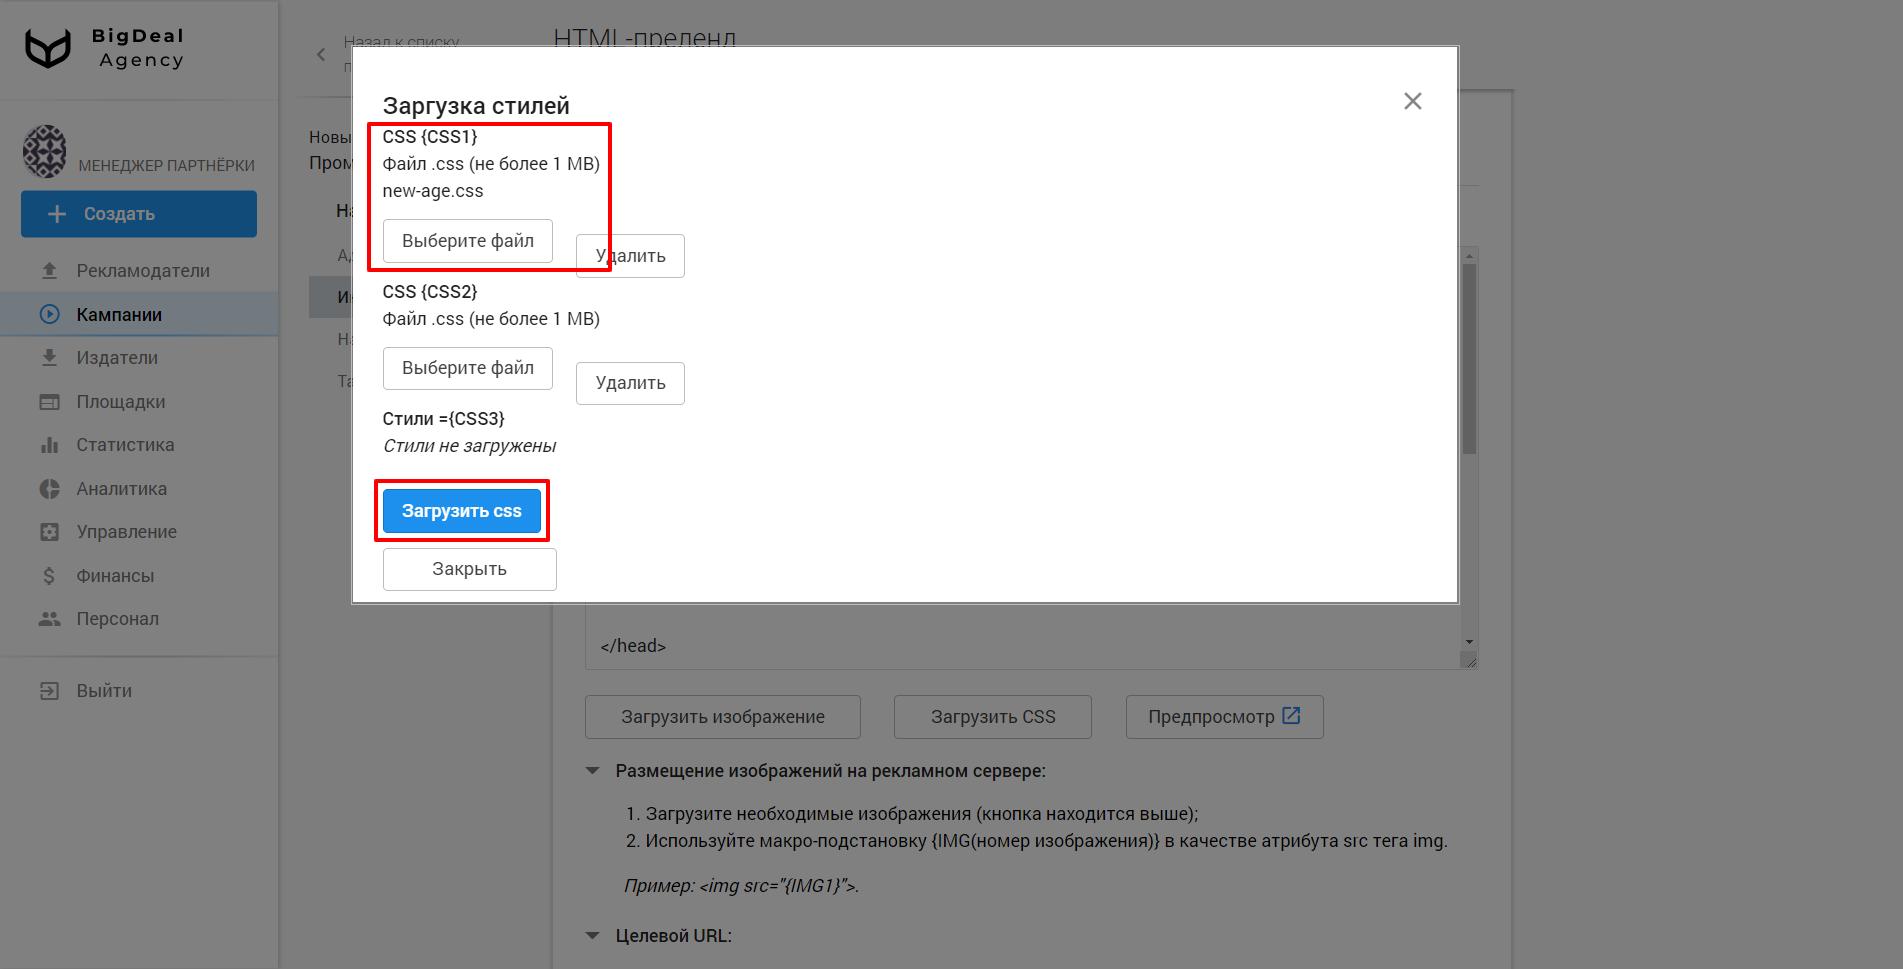 Настройка HTML-преленда для промоматериалов